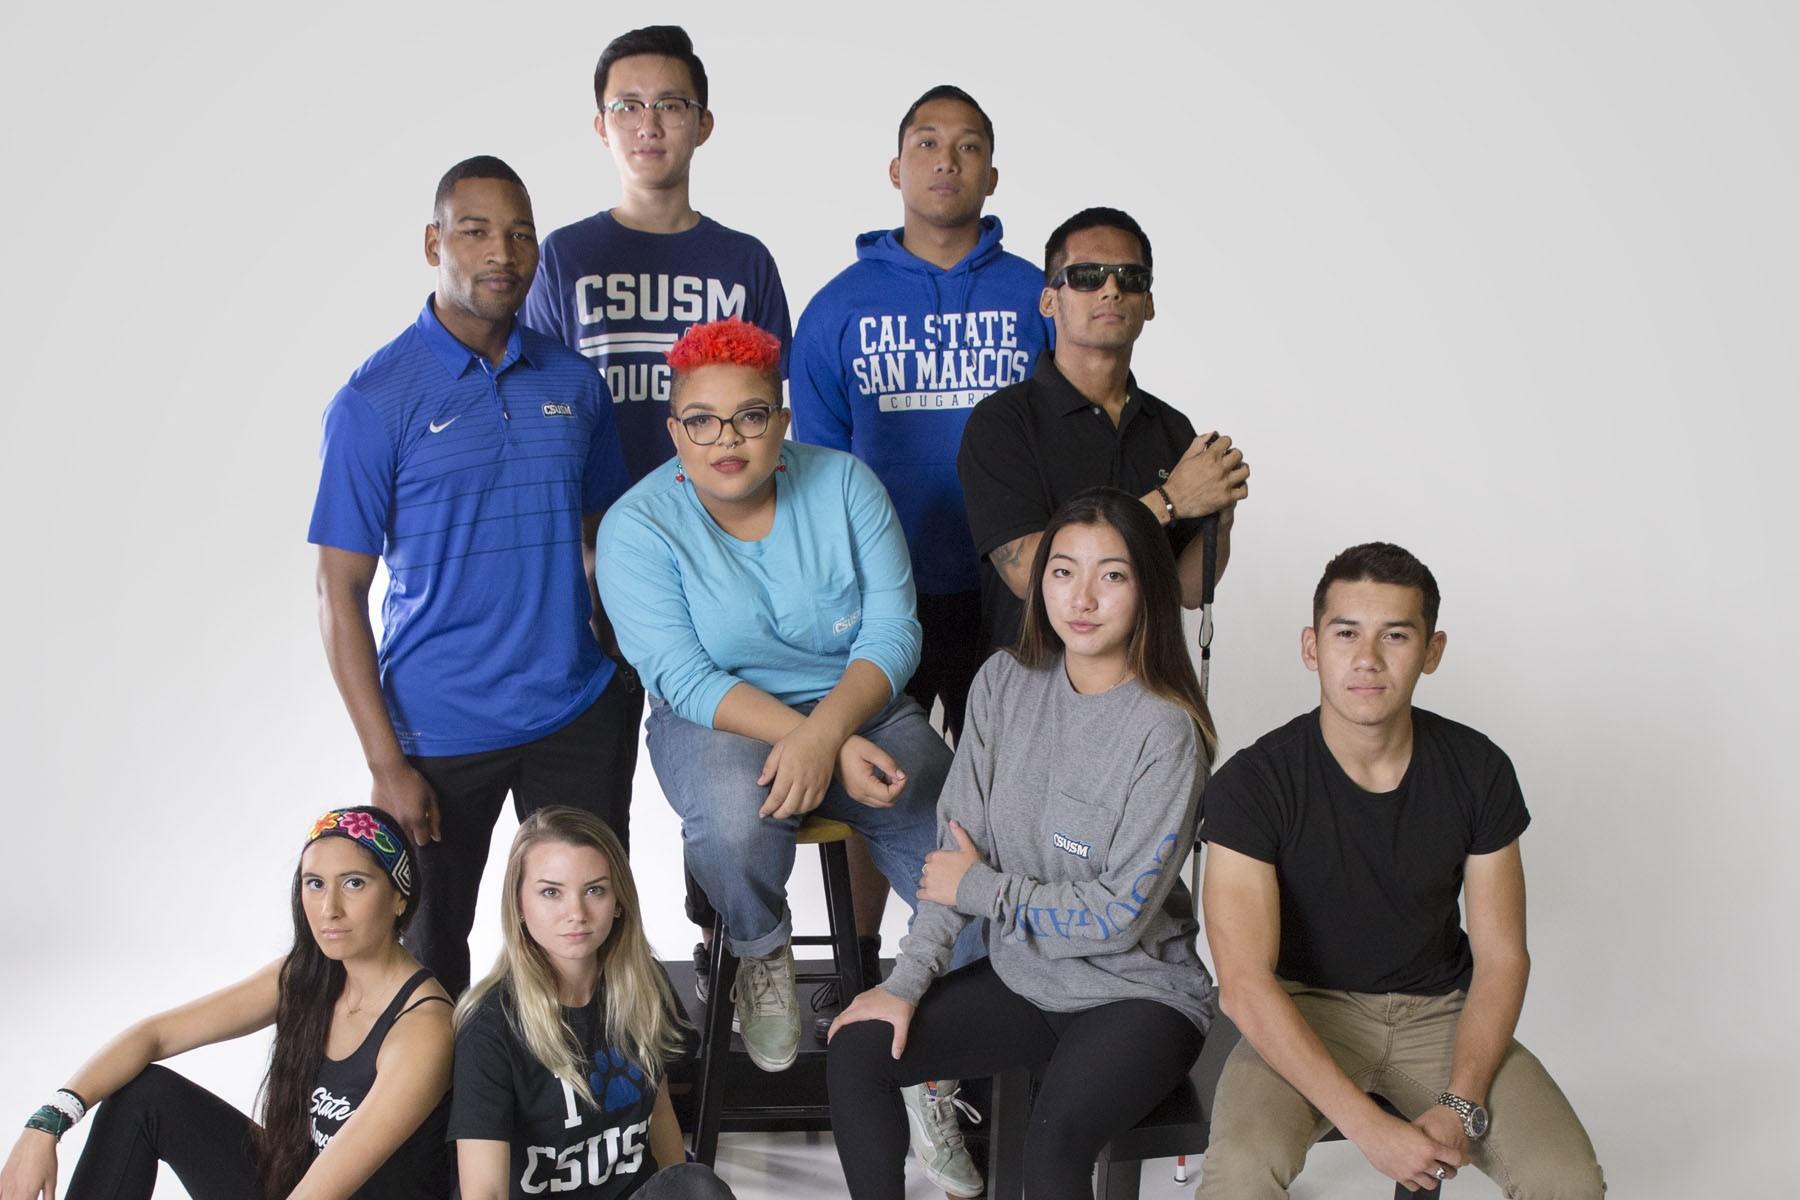 CSUSM students